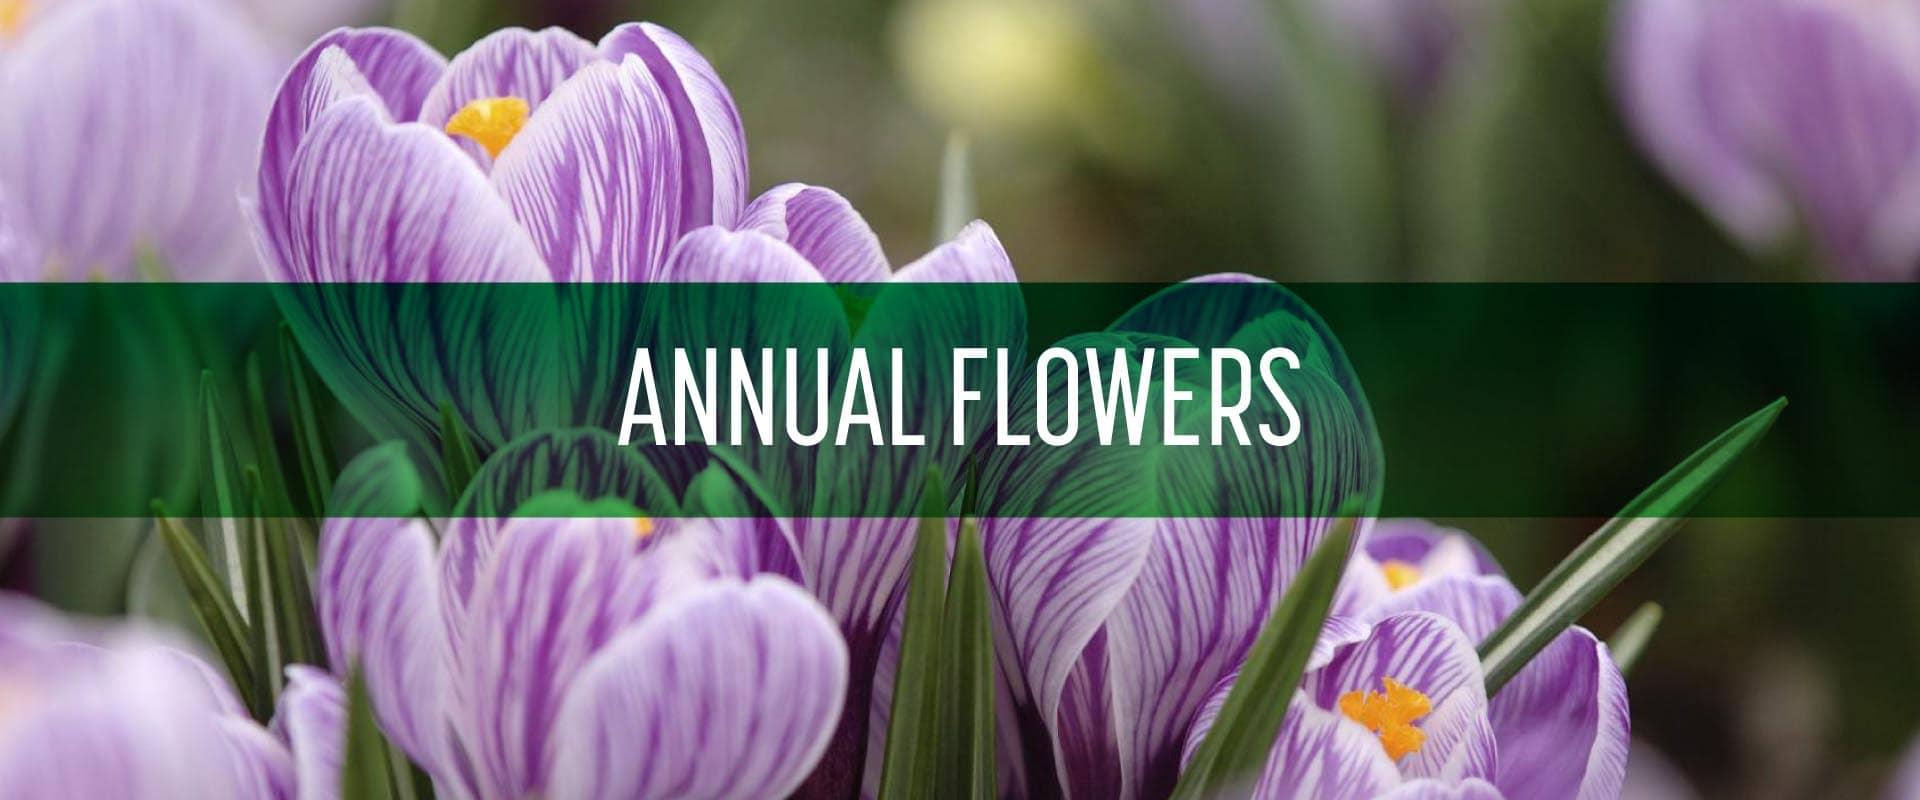 annual_flowers_schill_02-min